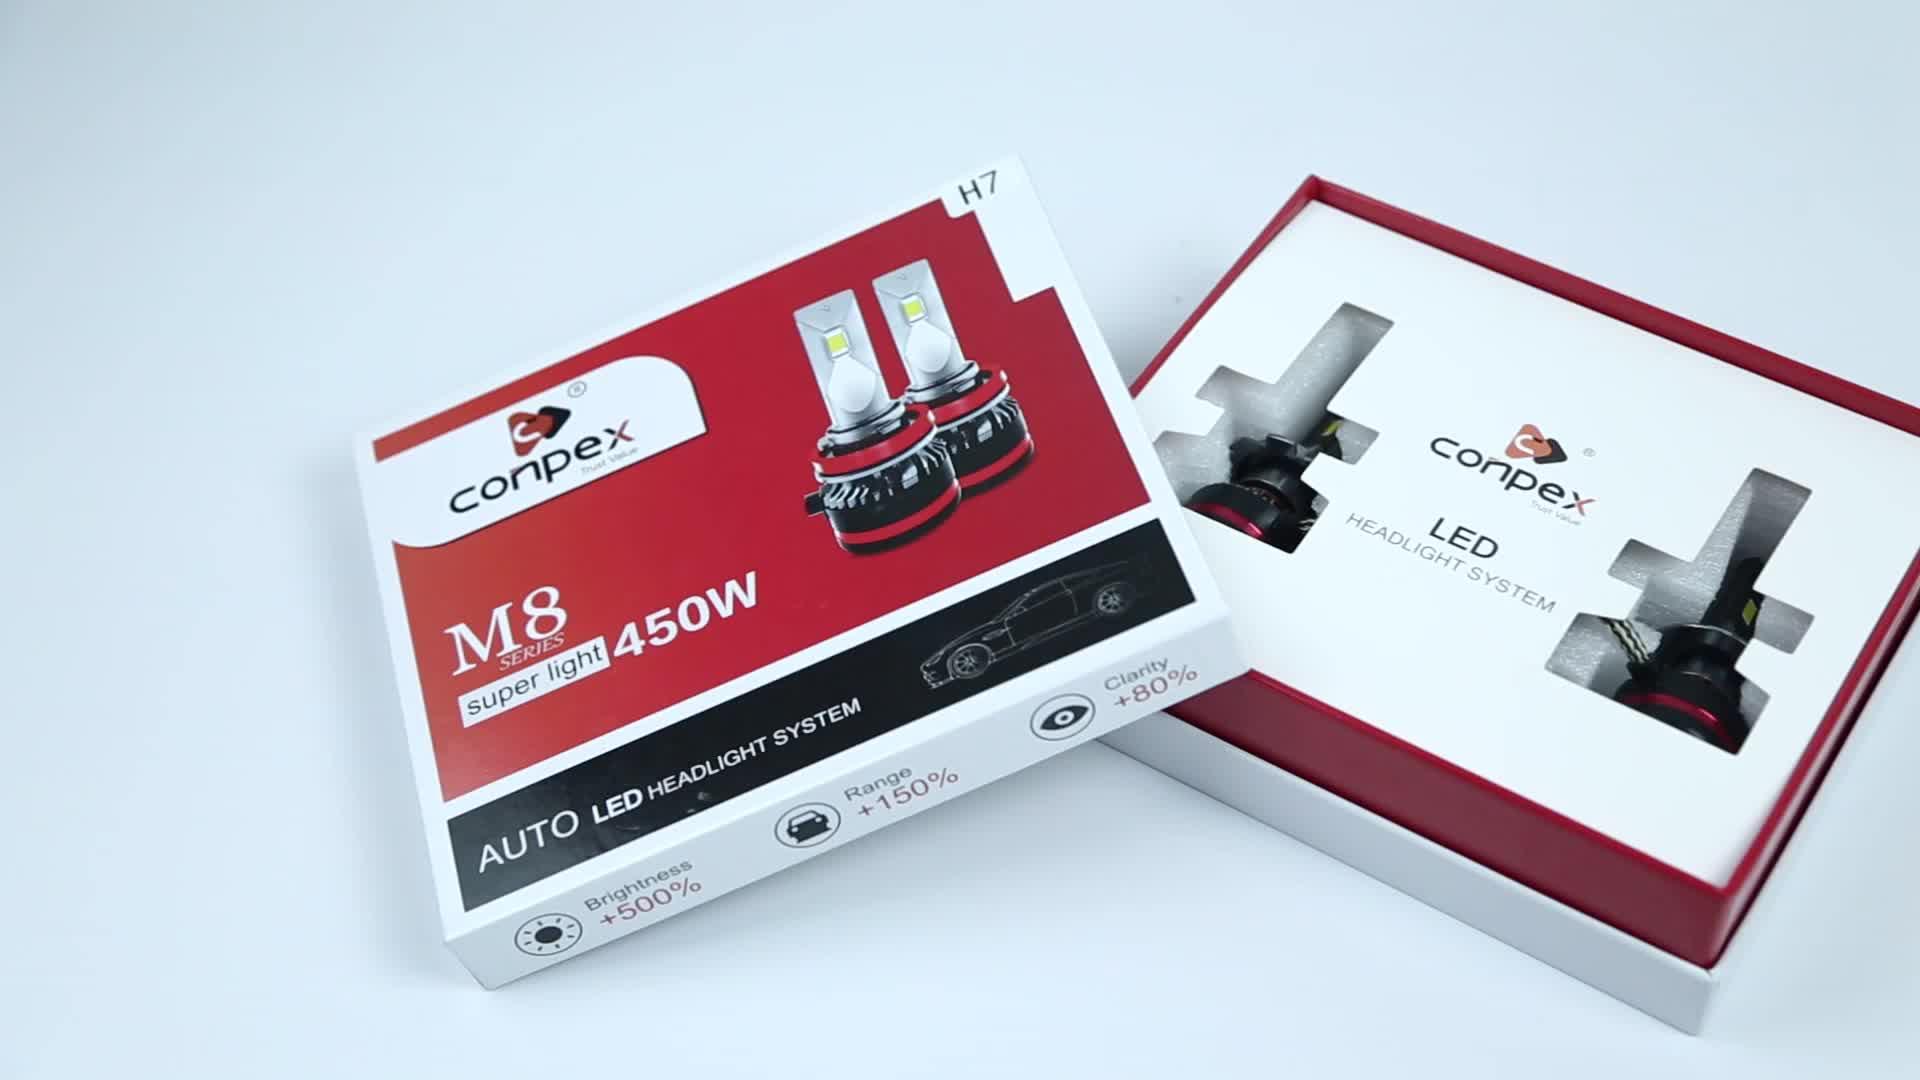 Conpex Gaya Baru 90 W 10000LM Super Terang M8 LED Headlight Kit H4 H1 H3 H7 H11 H13 9005 9006 9007 untuk Auto LED Lampu Mobil